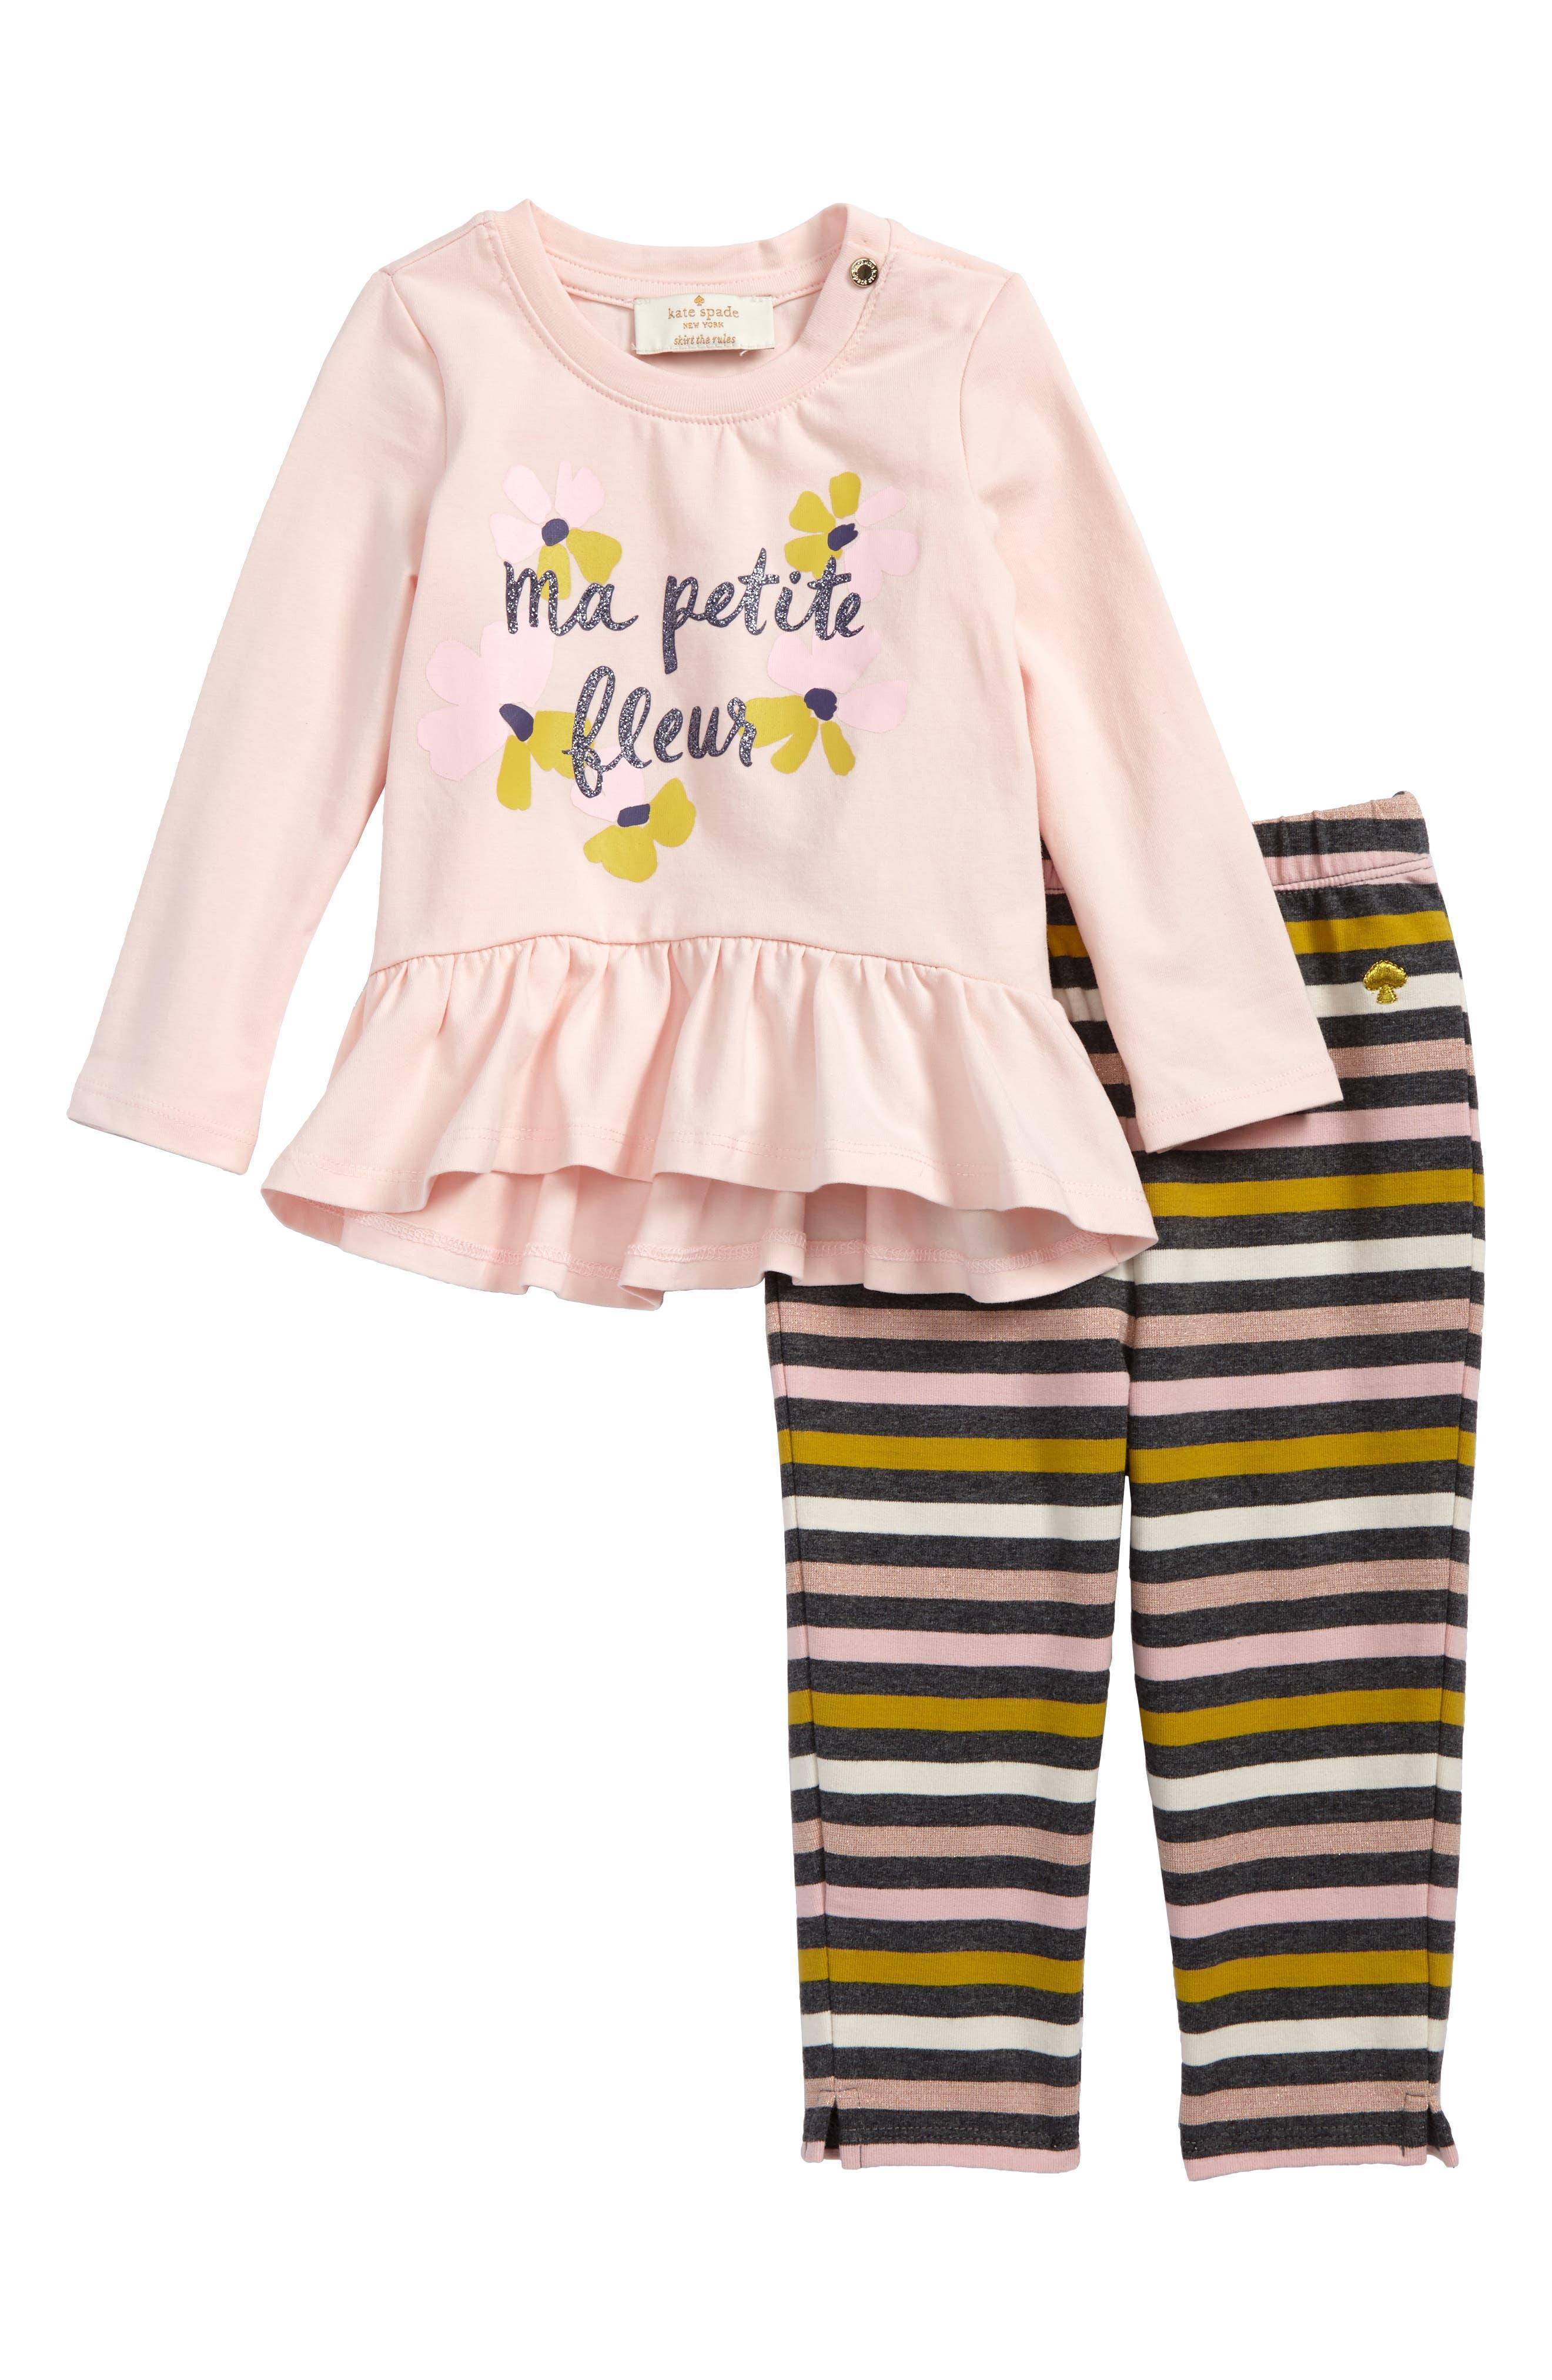 kate spade new york petit fleur ruffle top & leggings set (Baby Girls)